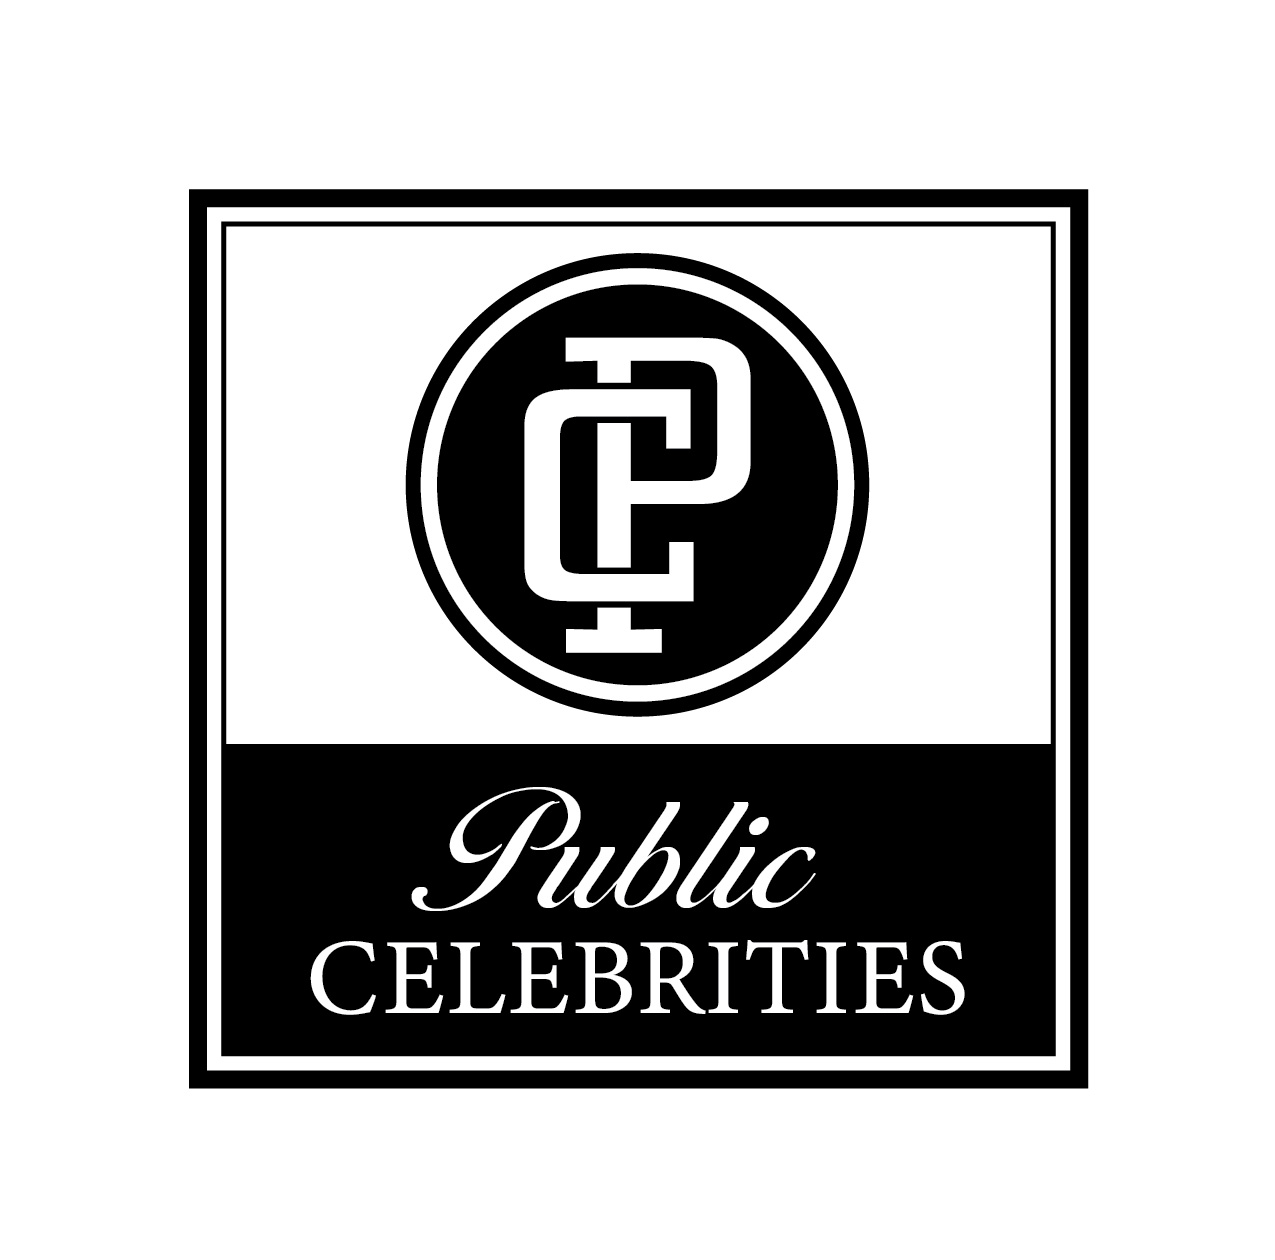 PubCel-logo-01